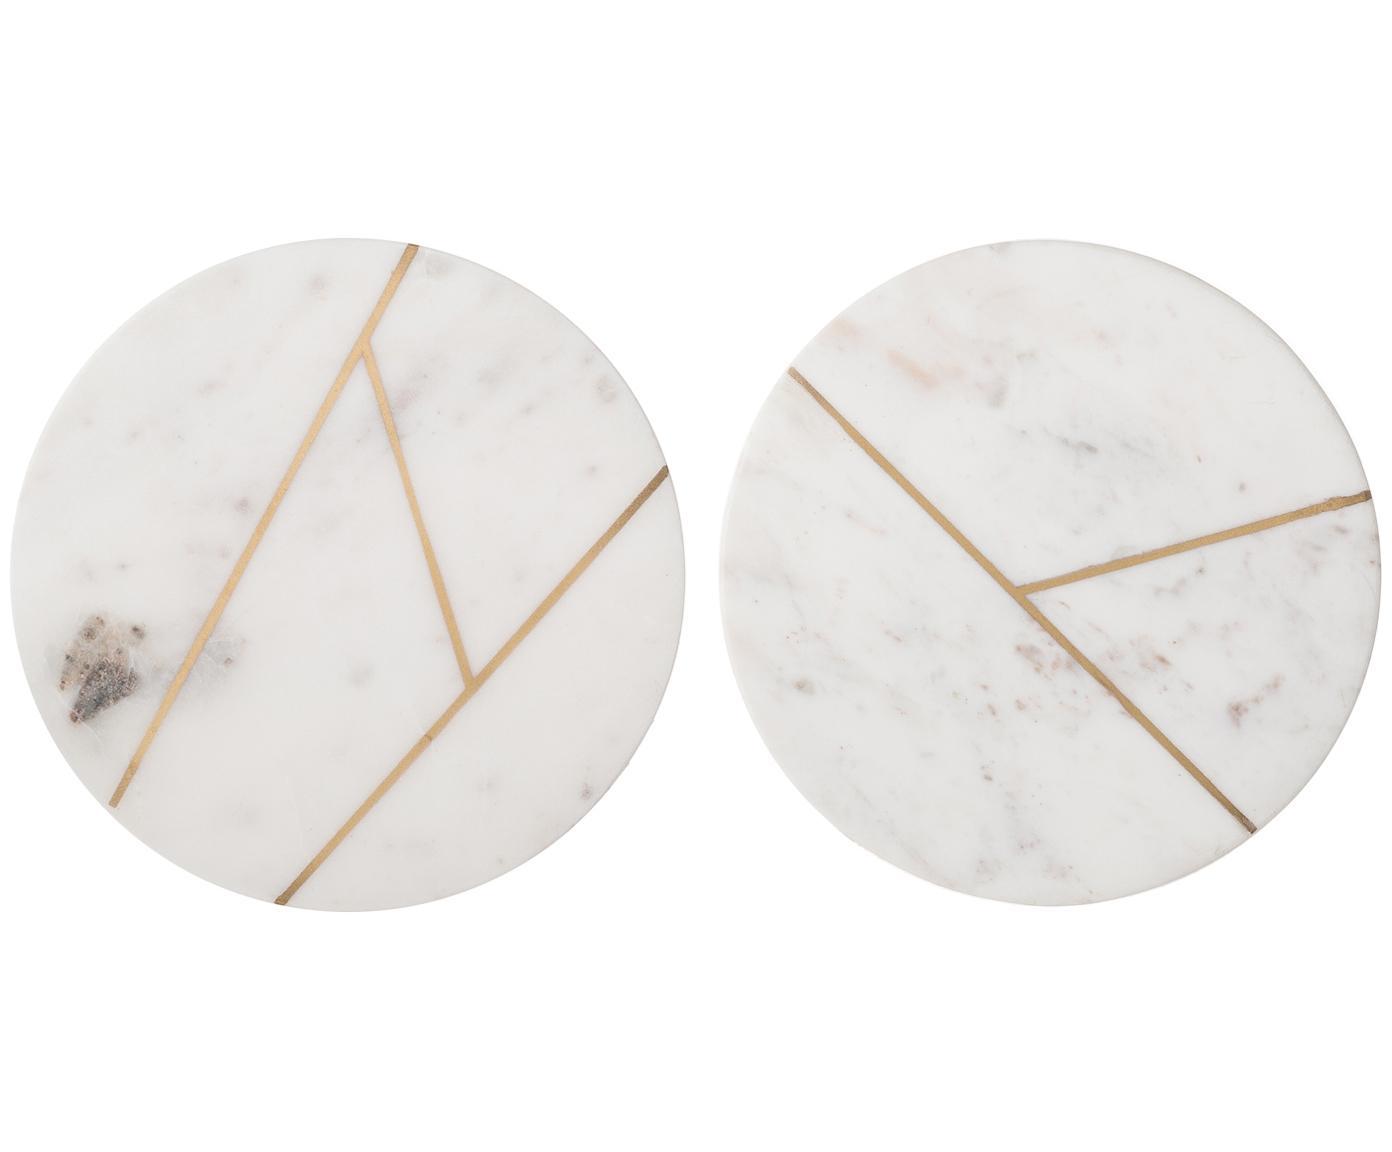 Marmorplatten-Set Marble, 2-tlg., Marmor, Weiss, marmoriert, Goldfarben, Ø 18 cm